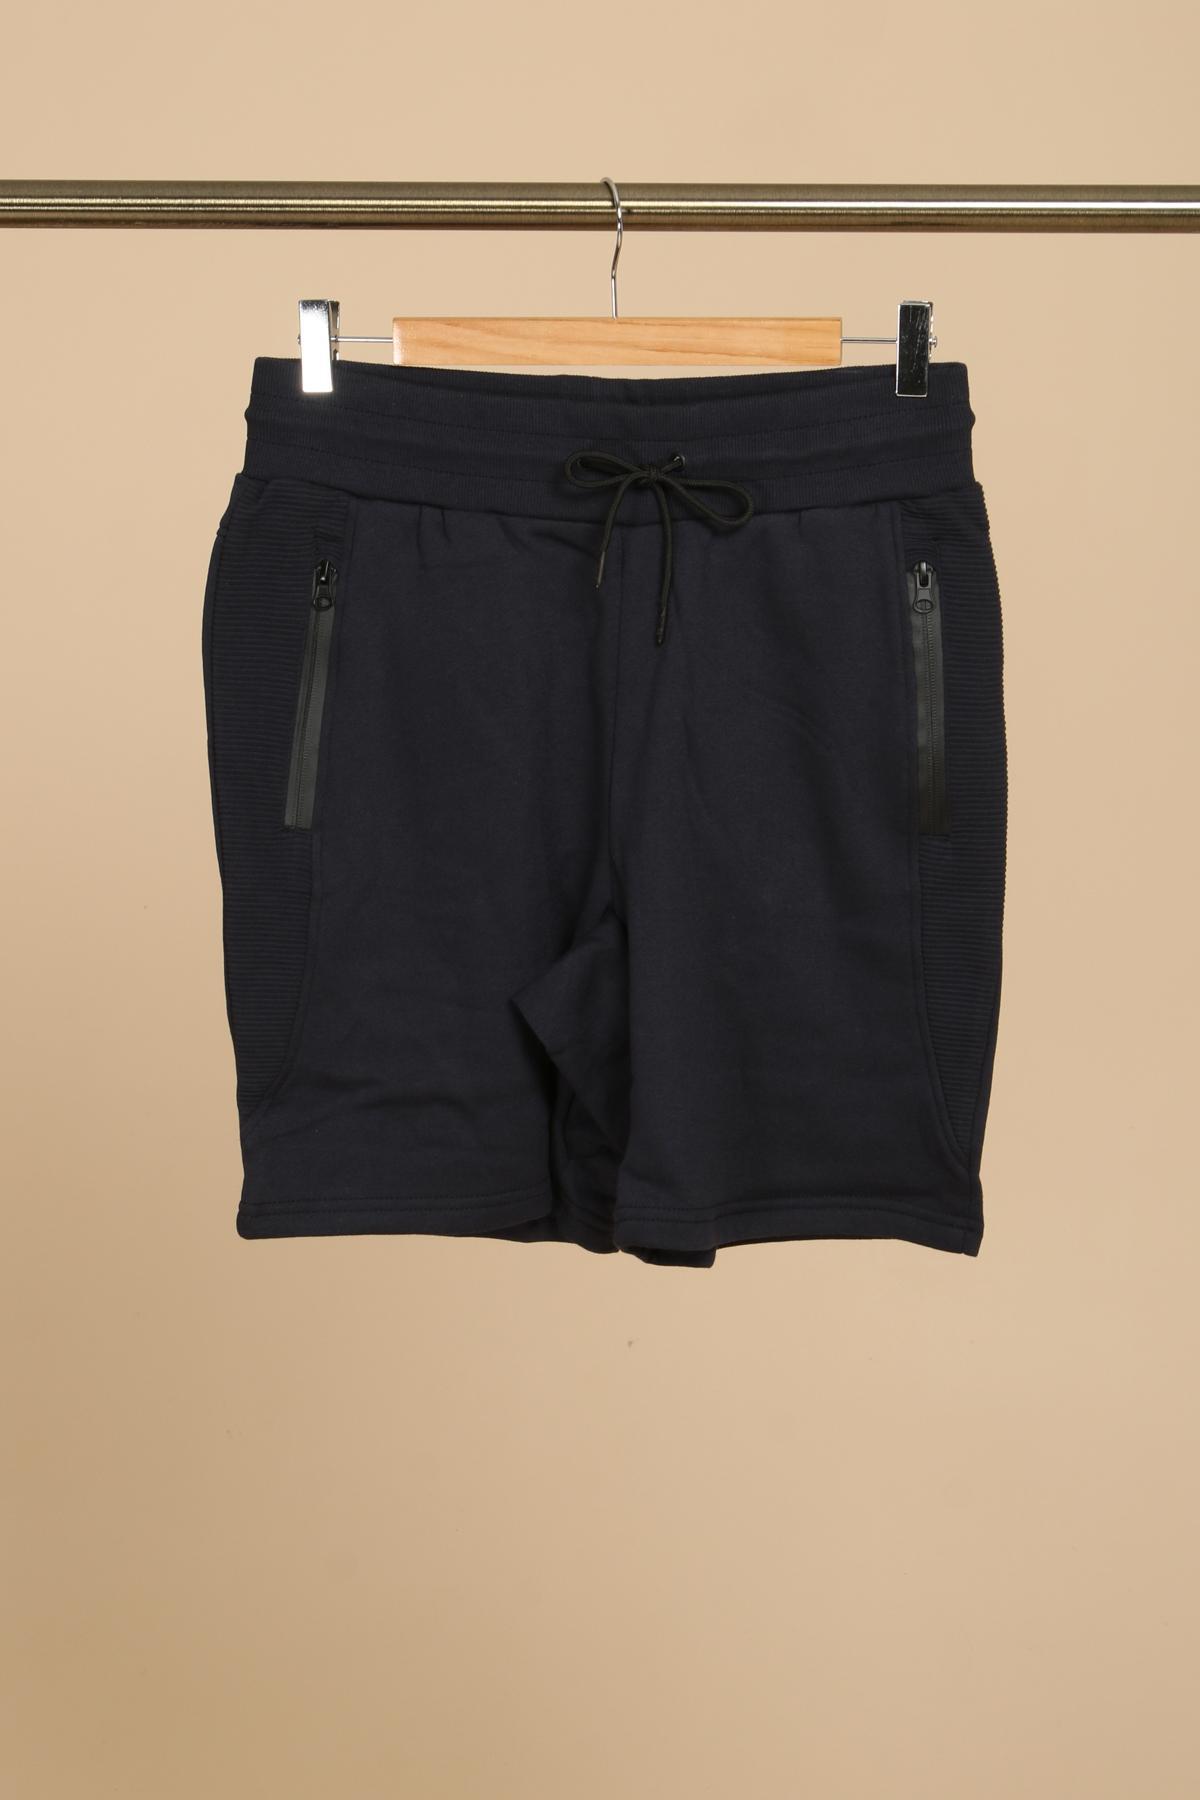 Shorts Homme Navy Zelia  BEAST #c eFashion Paris